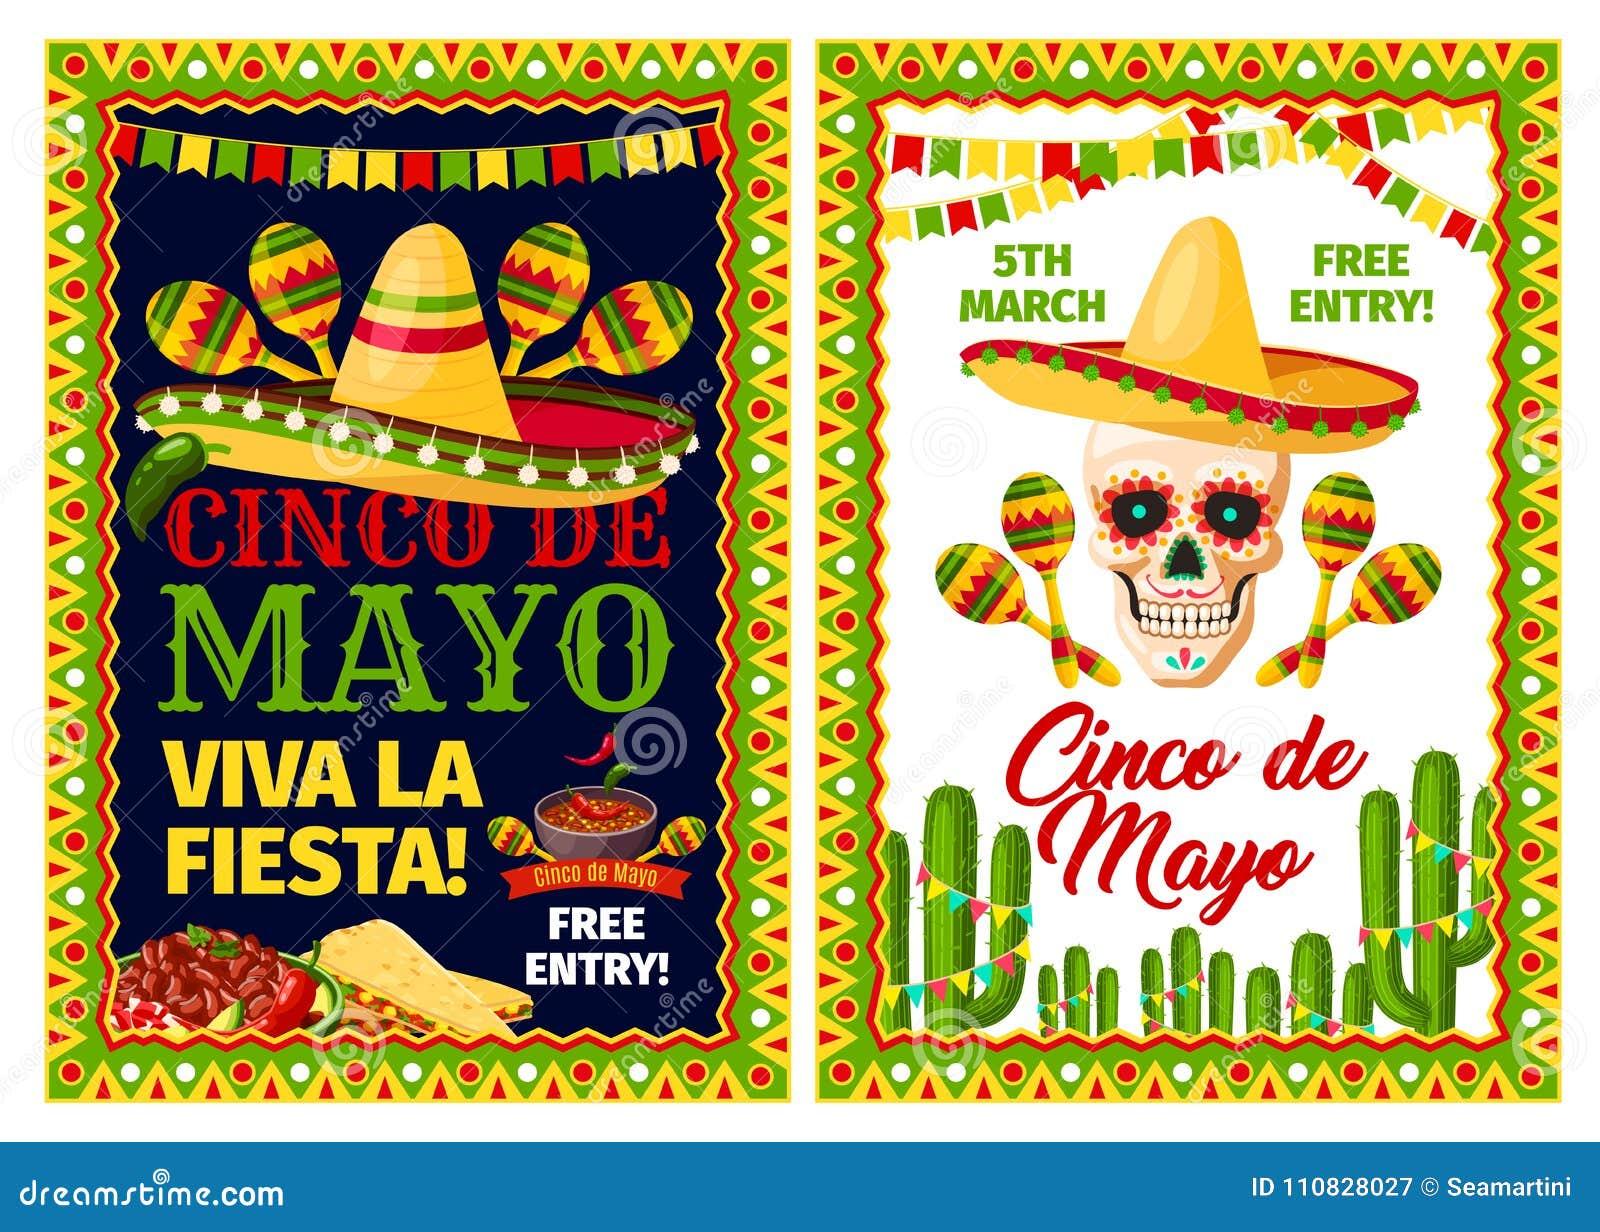 4cc2e786b282 Cinco de Mayo mexican holiday party invitation banner set. Fiesta party  sombrero hat